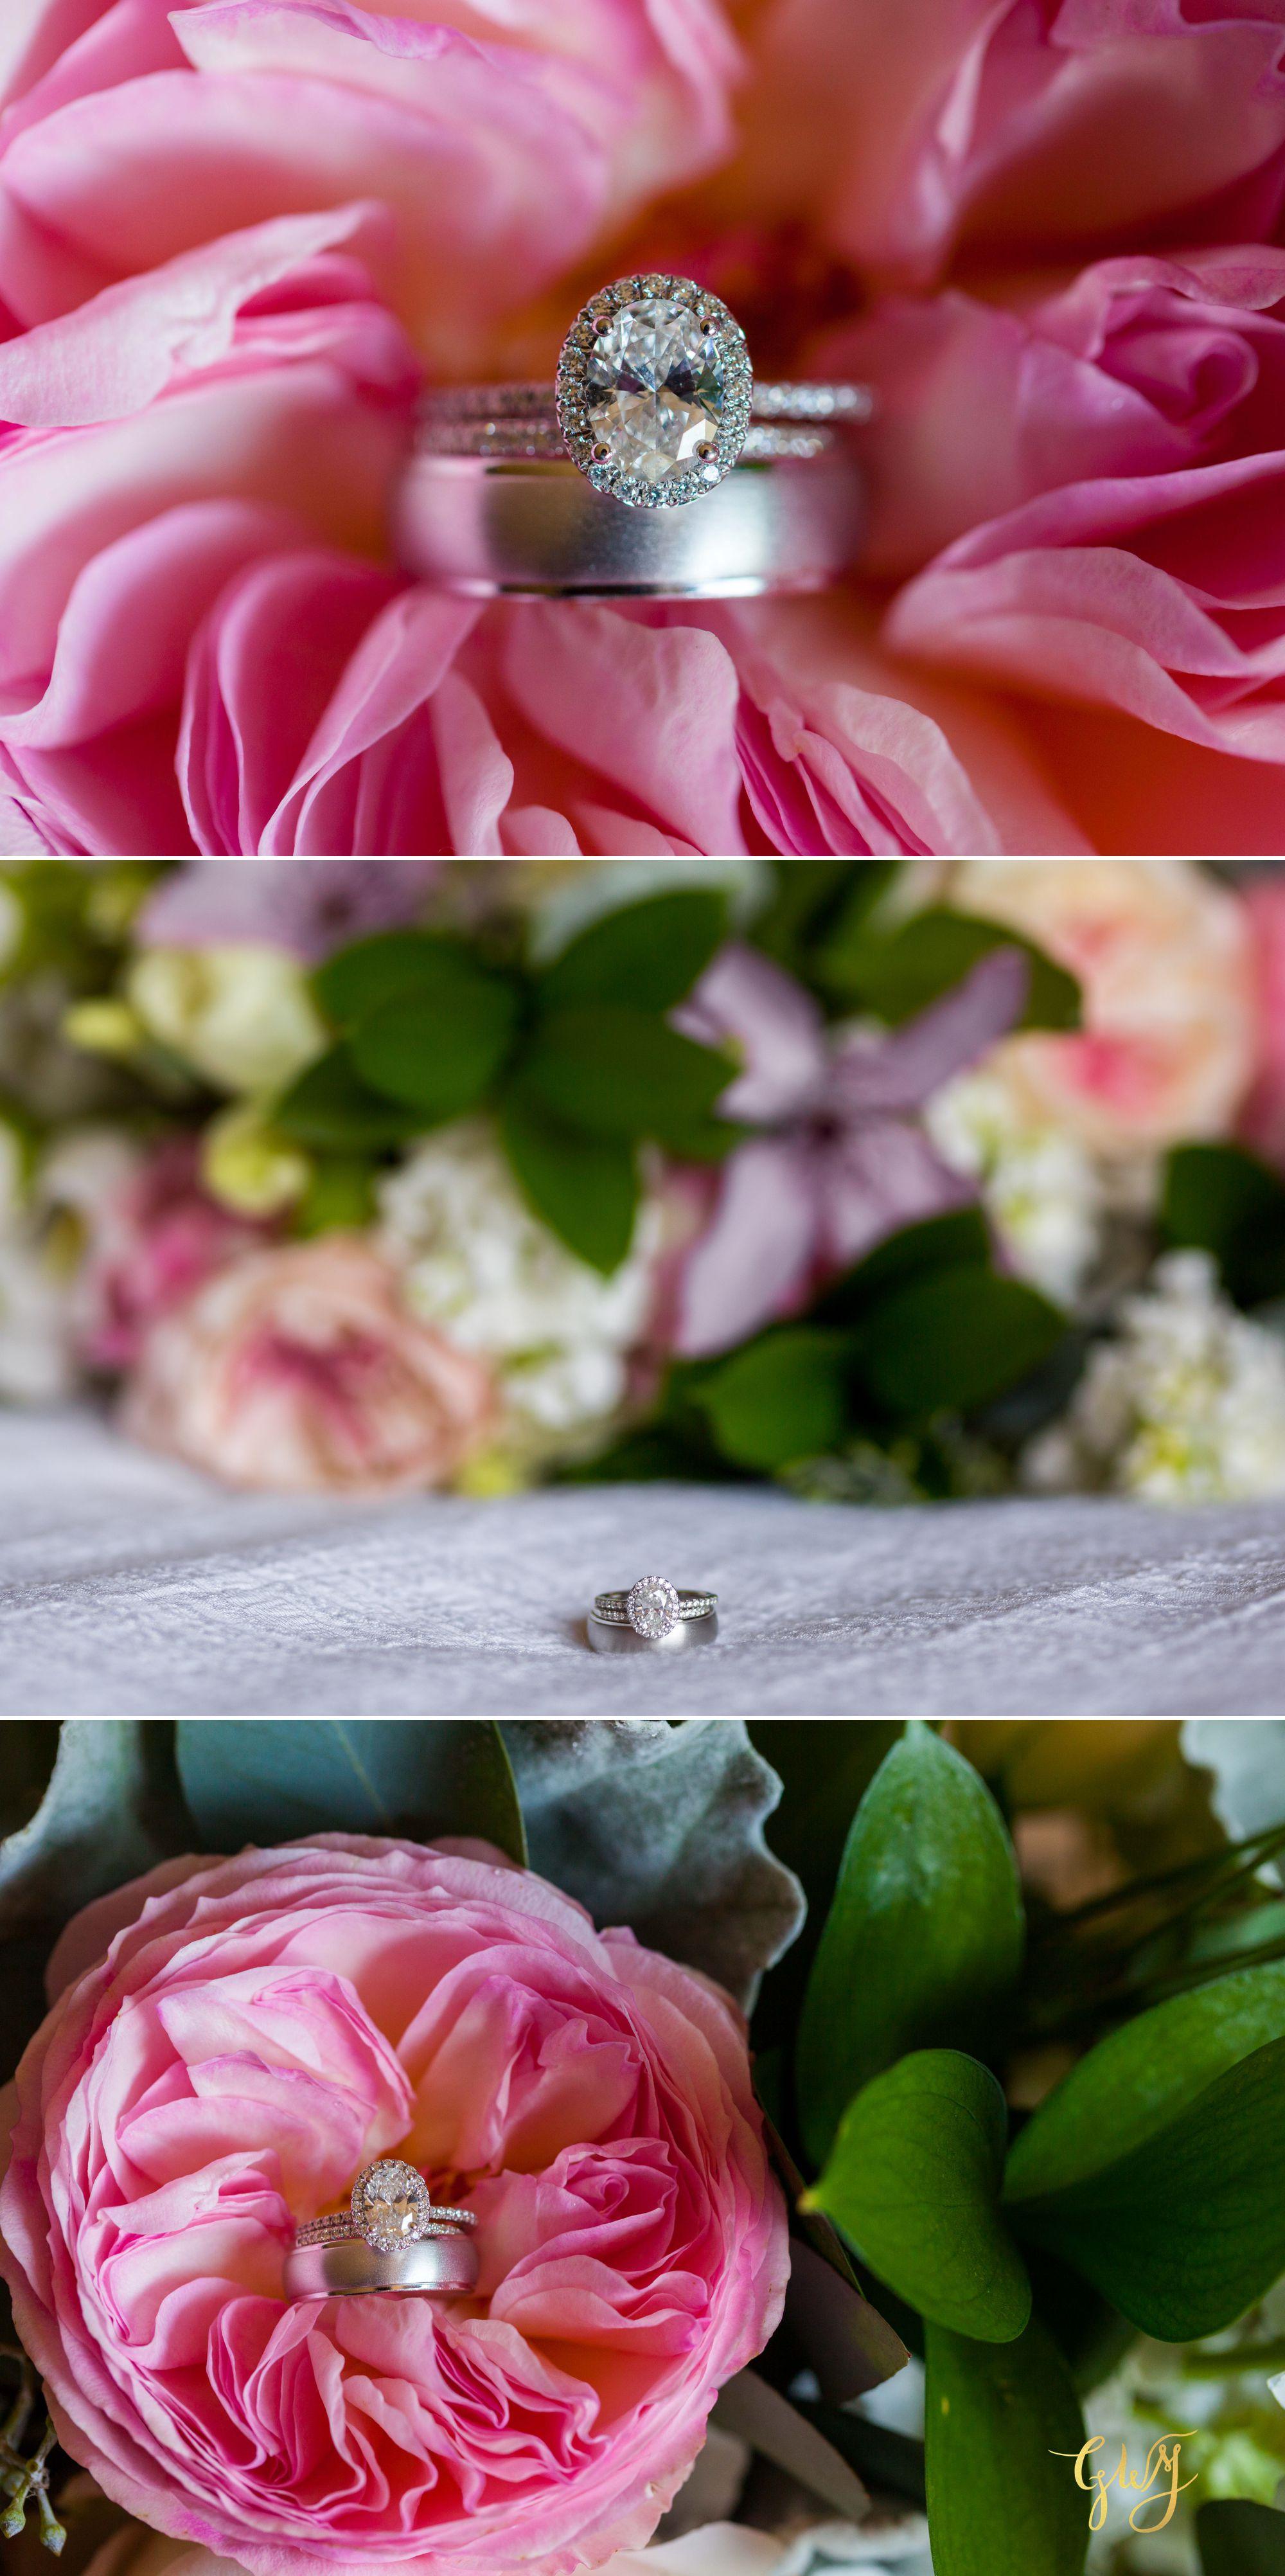 Javier + Kari Avenue of the Arts First Look Vintage Rose Wedding Ceremony Reception by Glass Woods Media 3.jpg